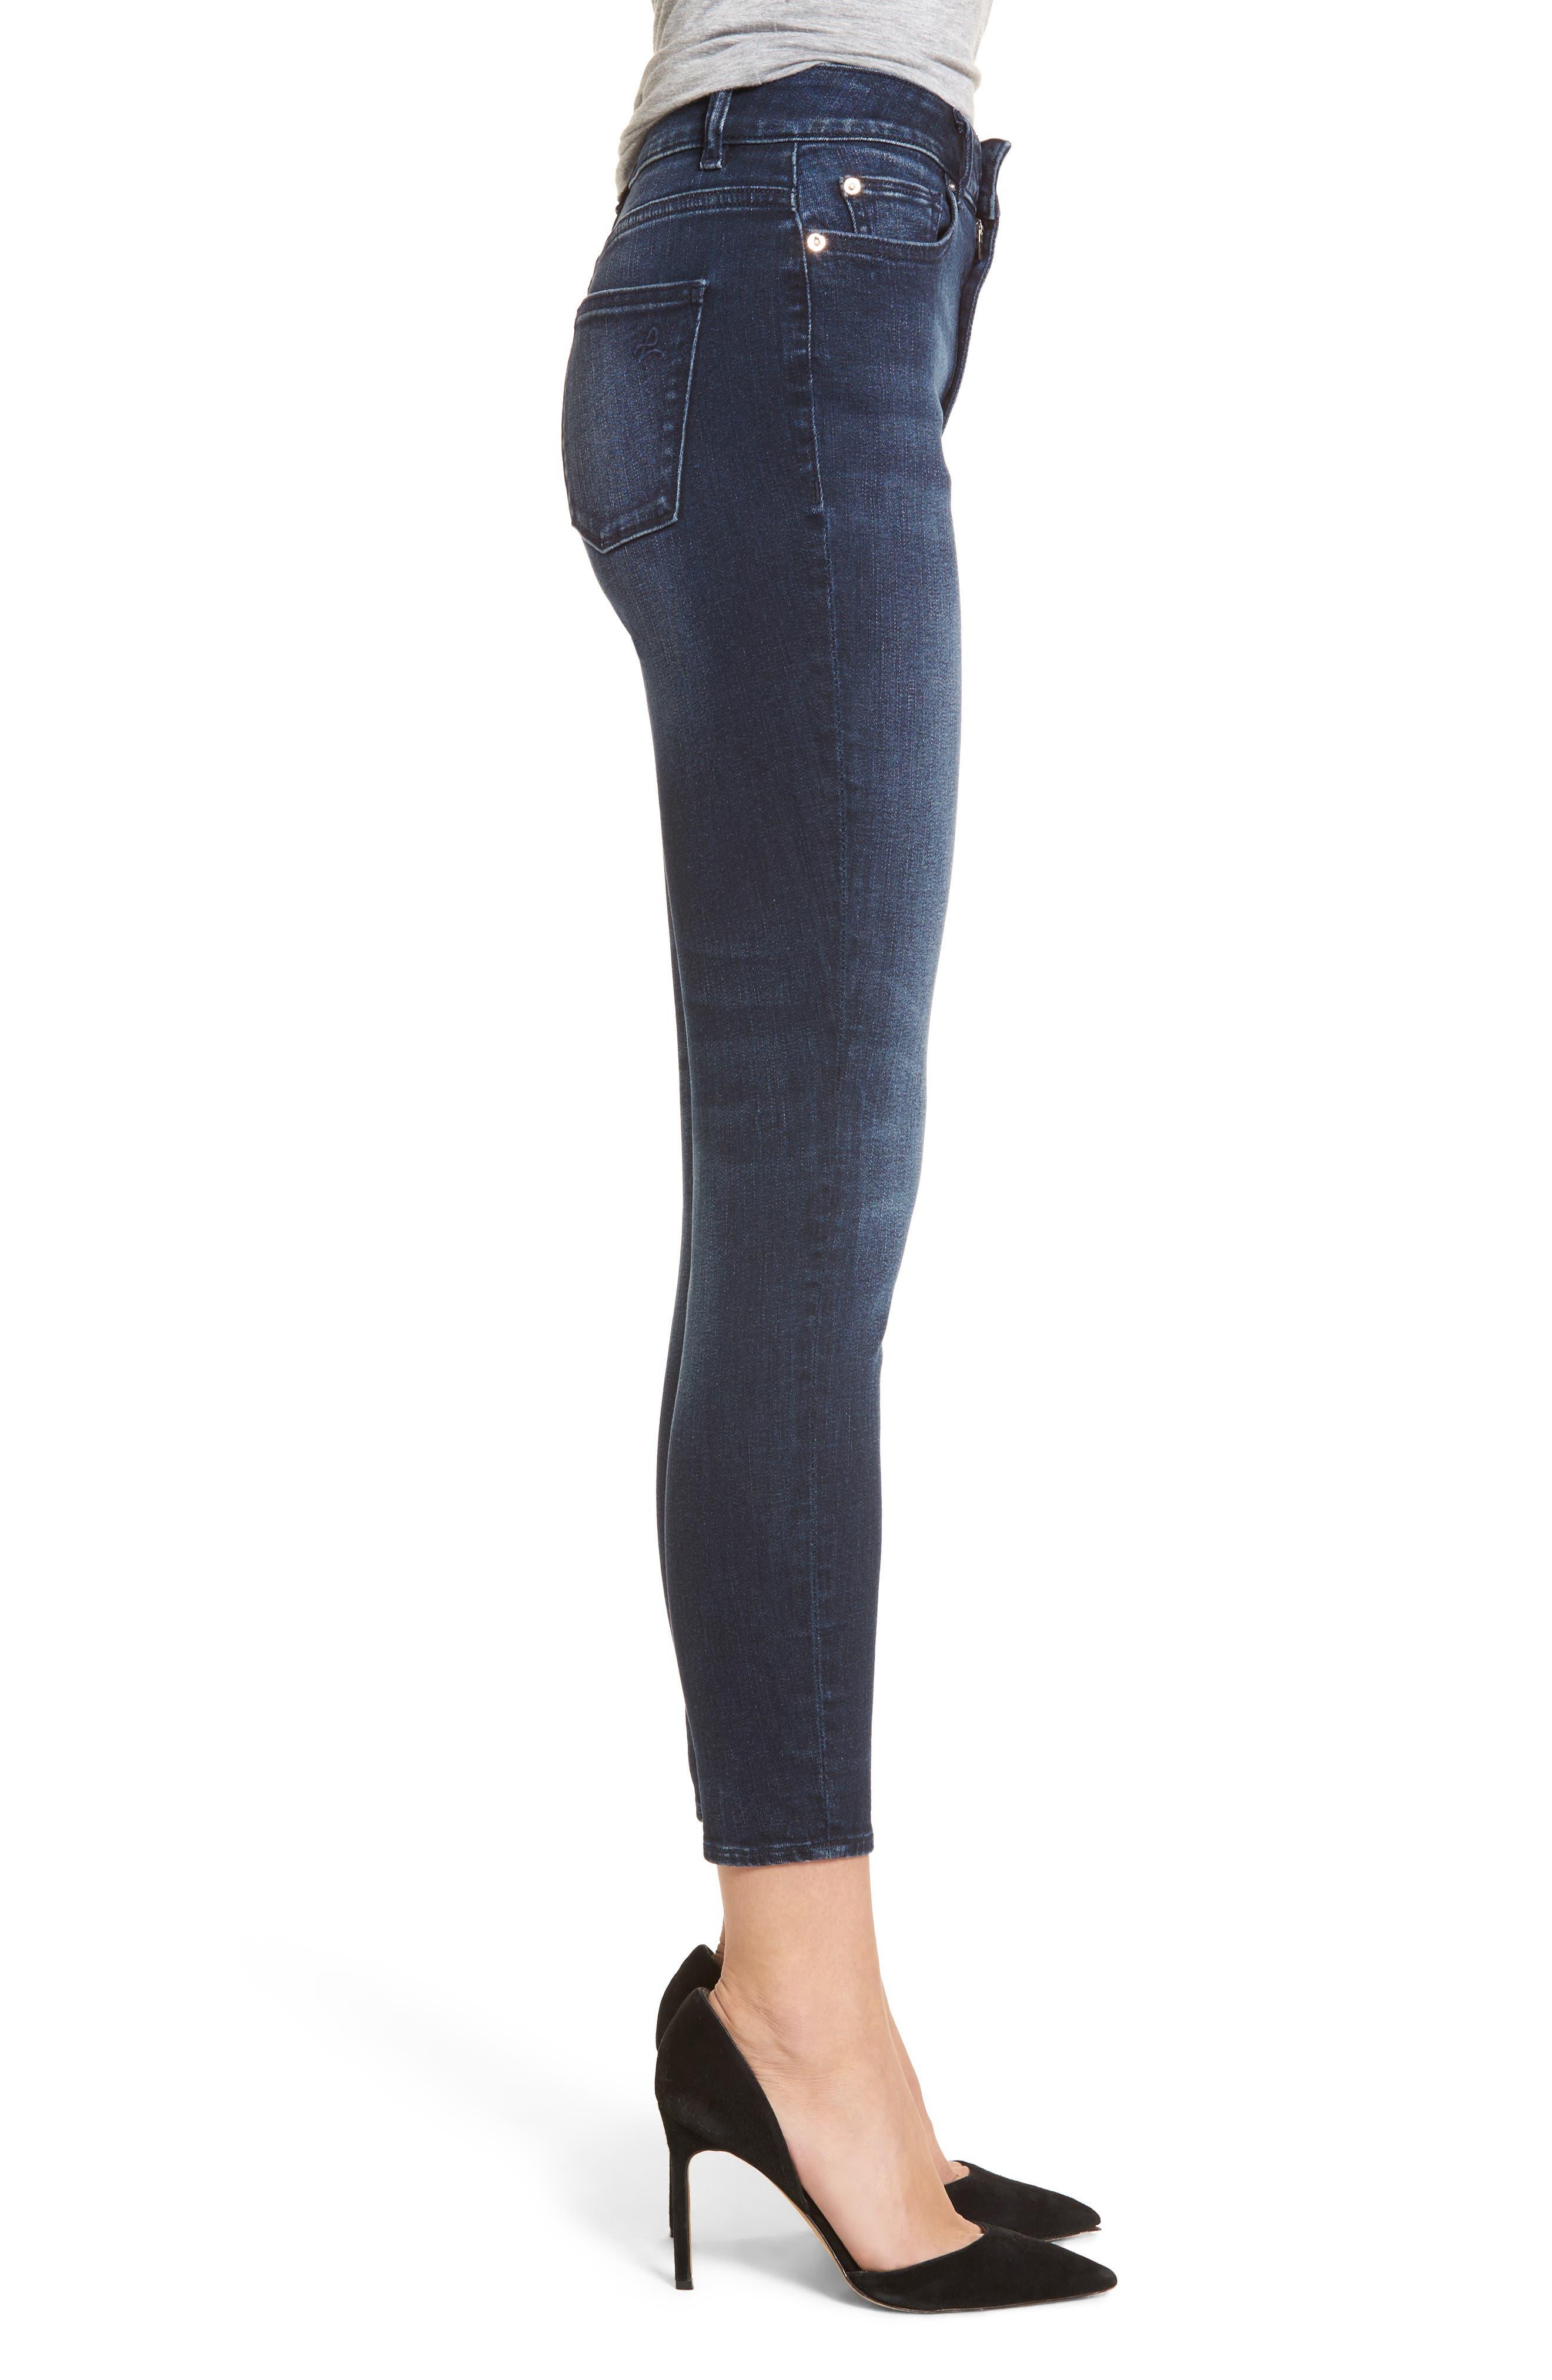 Carlie High Waist Ankle Skinny Jeans,                             Alternate thumbnail 3, color,                             Spritz